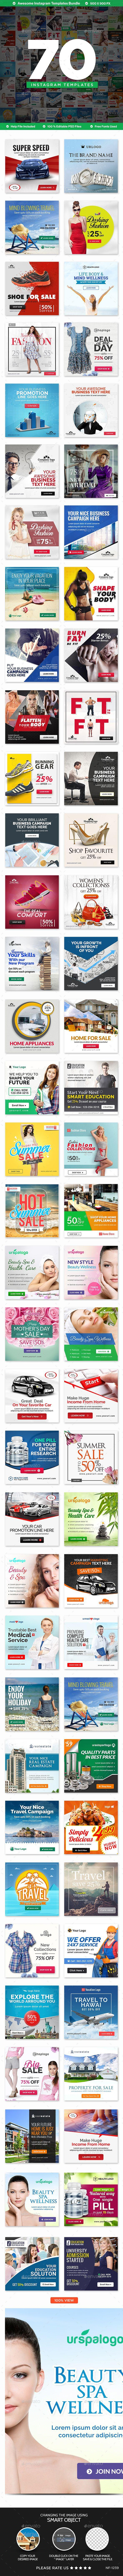 Multipurpose Instagram Banner Templates - 70 Designs. Download here: http://graphicriver.net/item/multipurpose-instagram-templates-70-designs/15713181?ref=yinkira